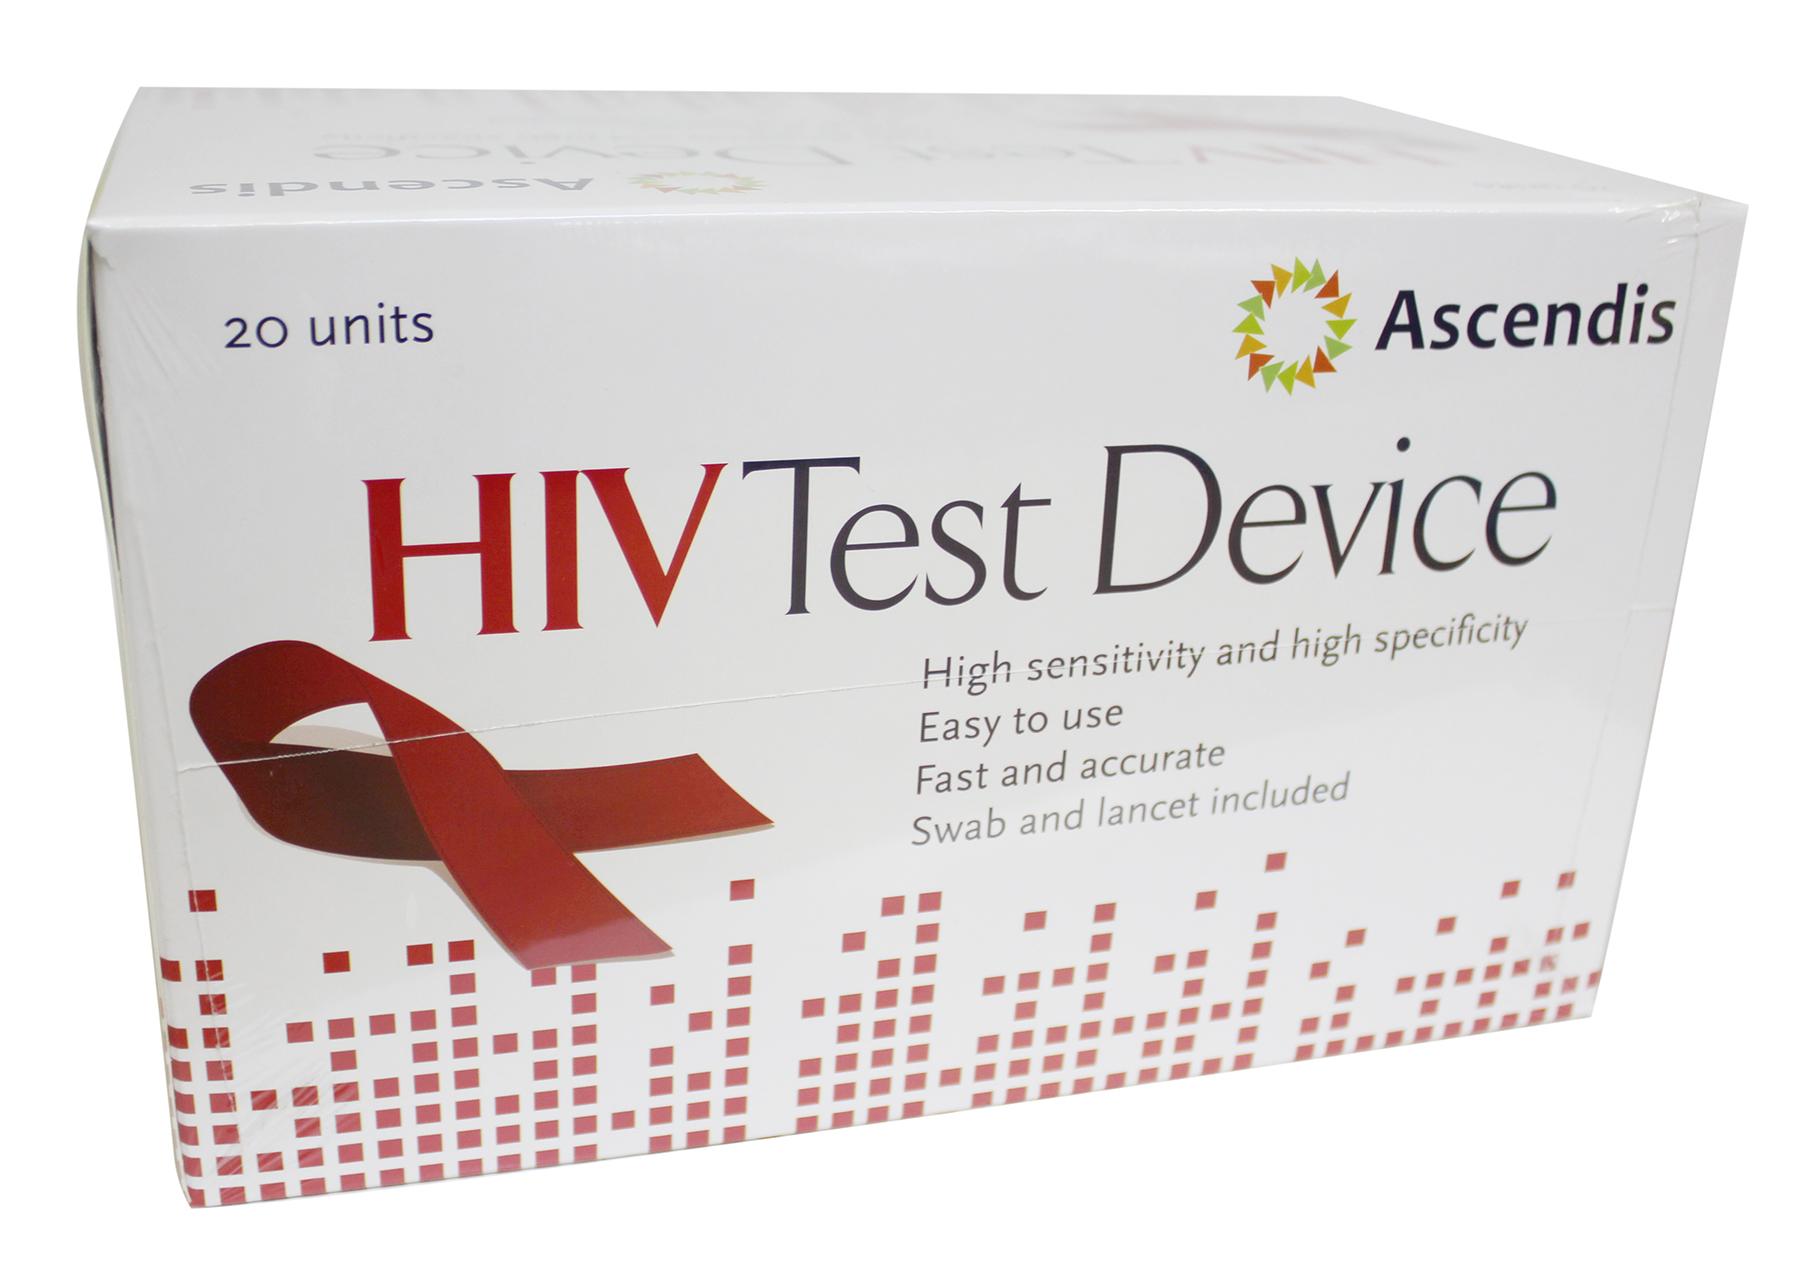 HIV Test Device 20 units